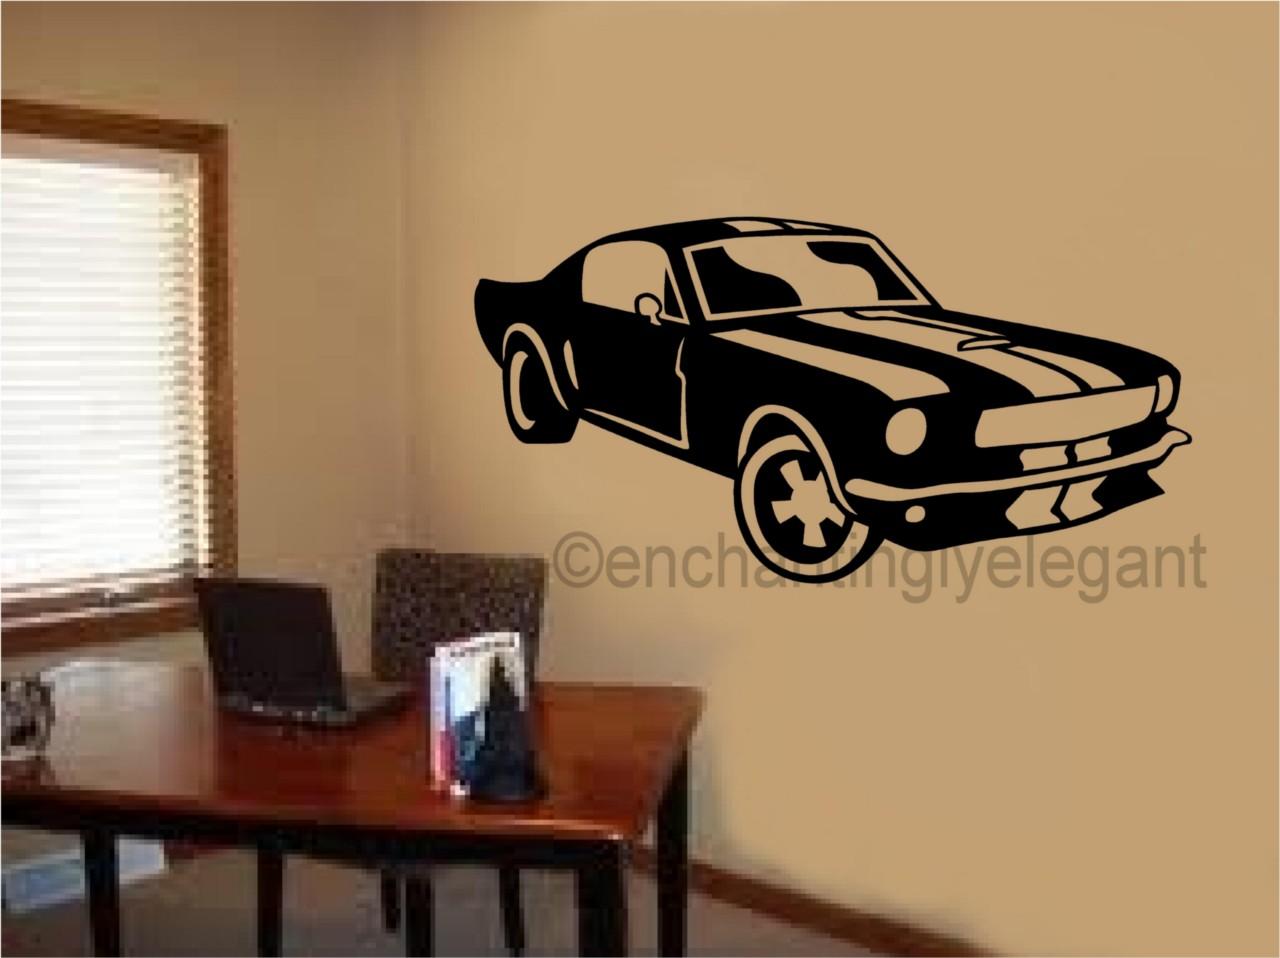 mustang shelby car vinyl decal wall sticker office shop teen boy room decor art ebay. Black Bedroom Furniture Sets. Home Design Ideas